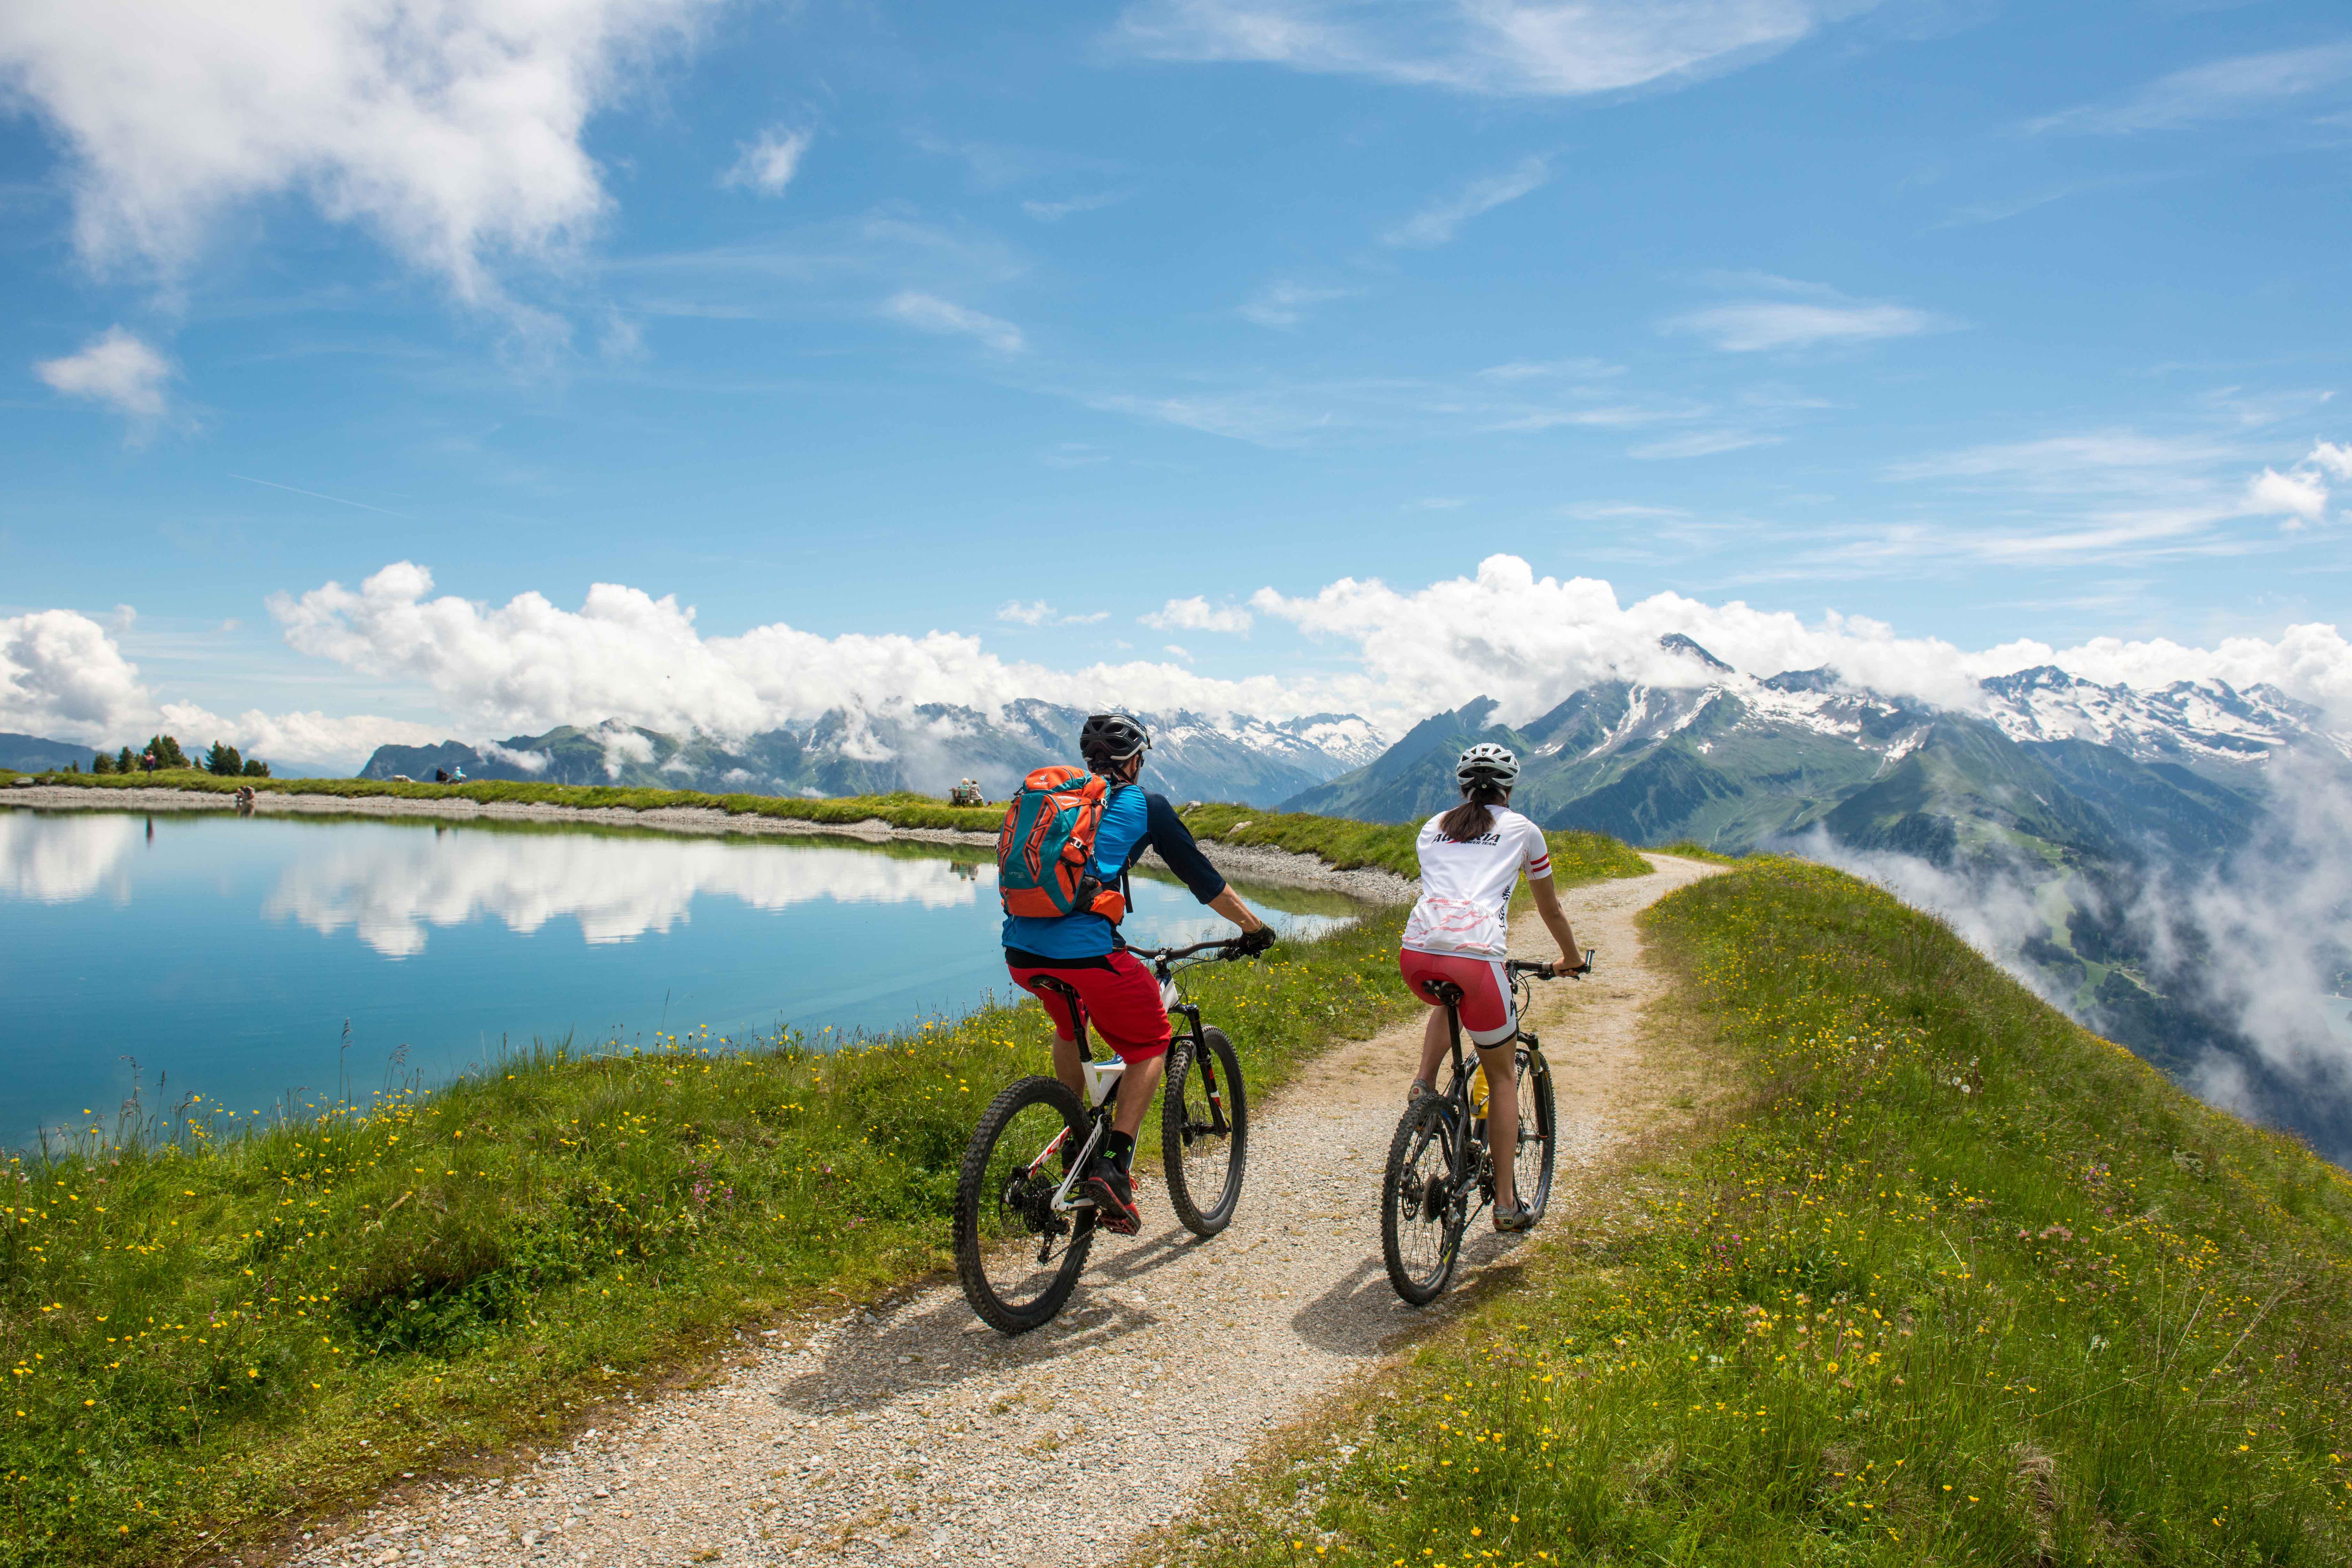 Mountainbiken in de bergen rondom Mayrhofen